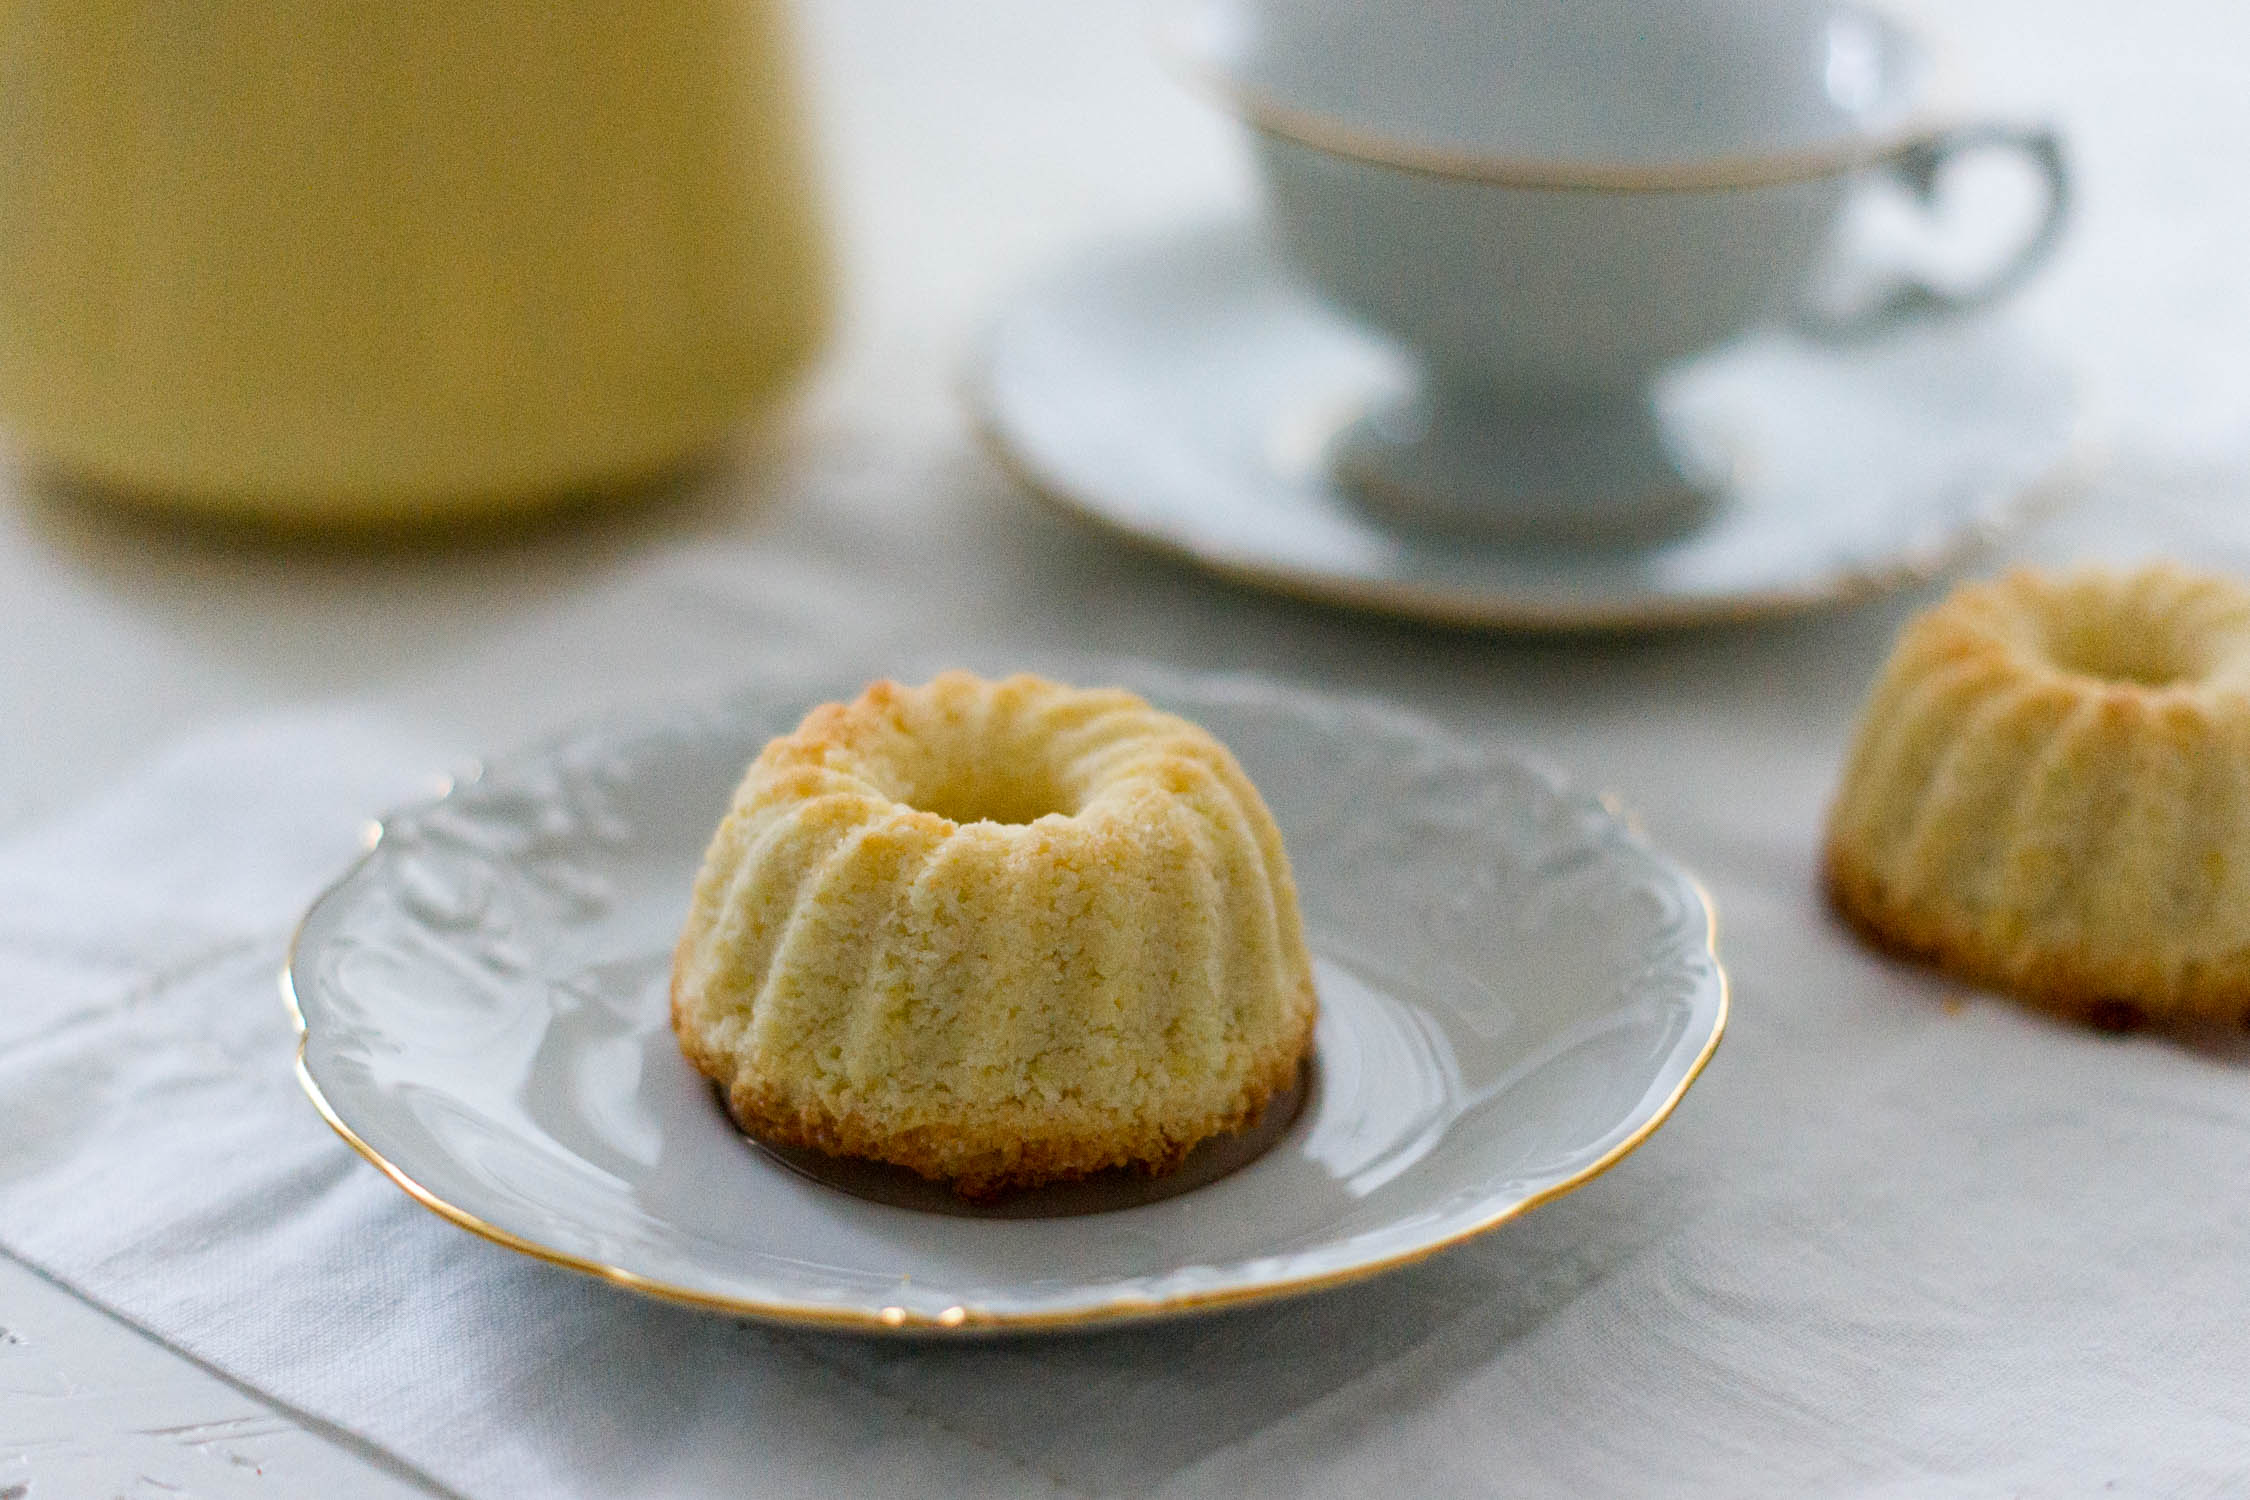 glutenfreier kokos mini gugelhupf yellowgirl der diy lifestyle blog. Black Bedroom Furniture Sets. Home Design Ideas